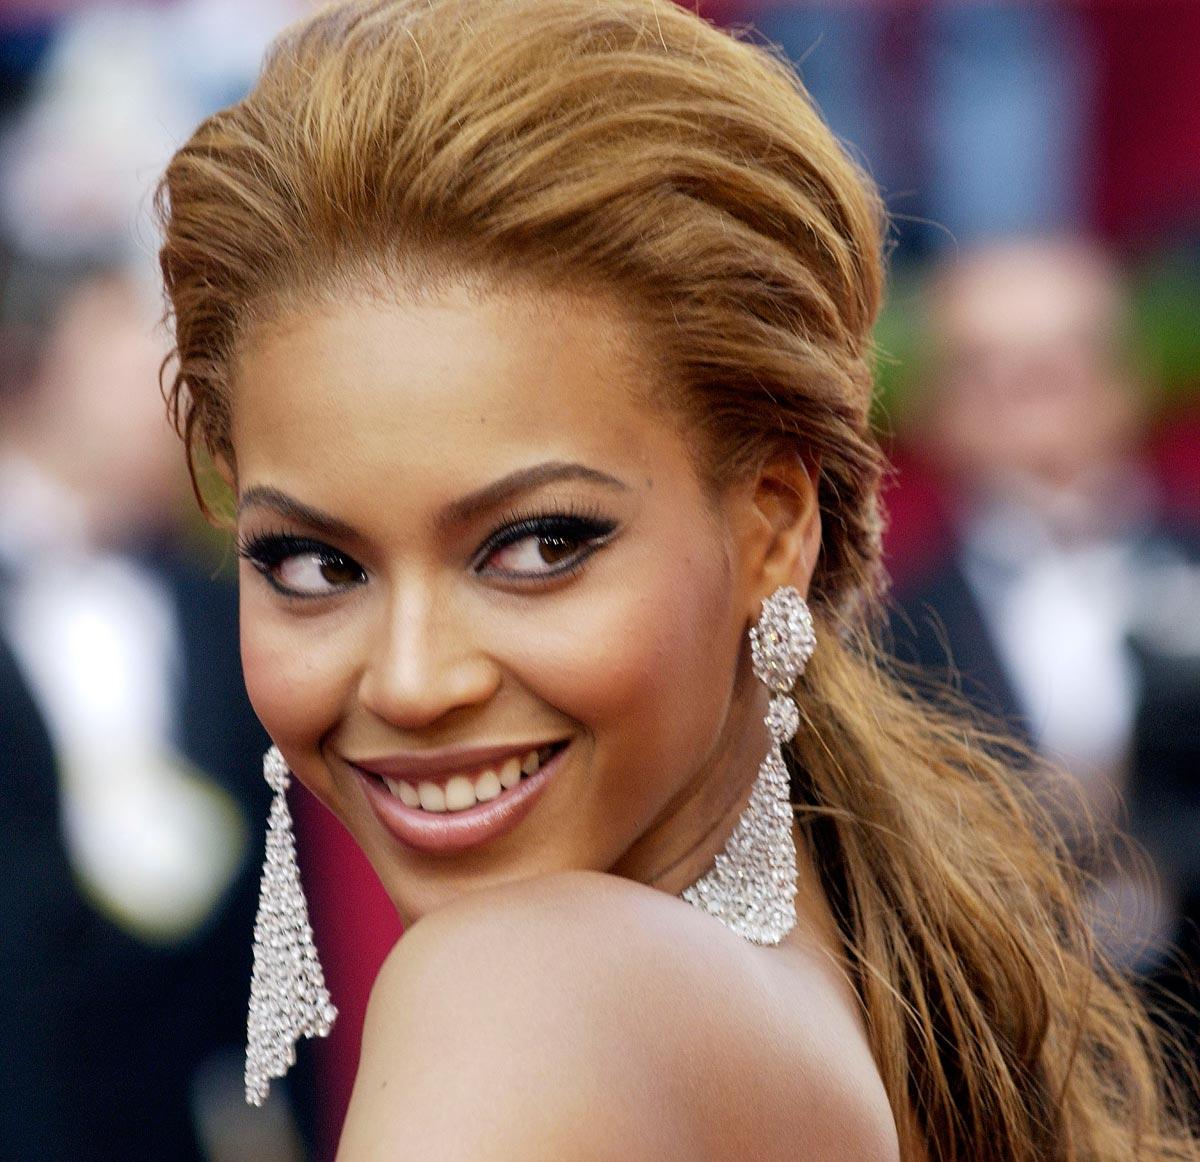 http://1.bp.blogspot.com/-VLPrQufjzDk/TxIBHYVE7rI/AAAAAAAAAw8/sTbSv3RdnSg/s1600/beyonce-knowles-hair-05.jpg